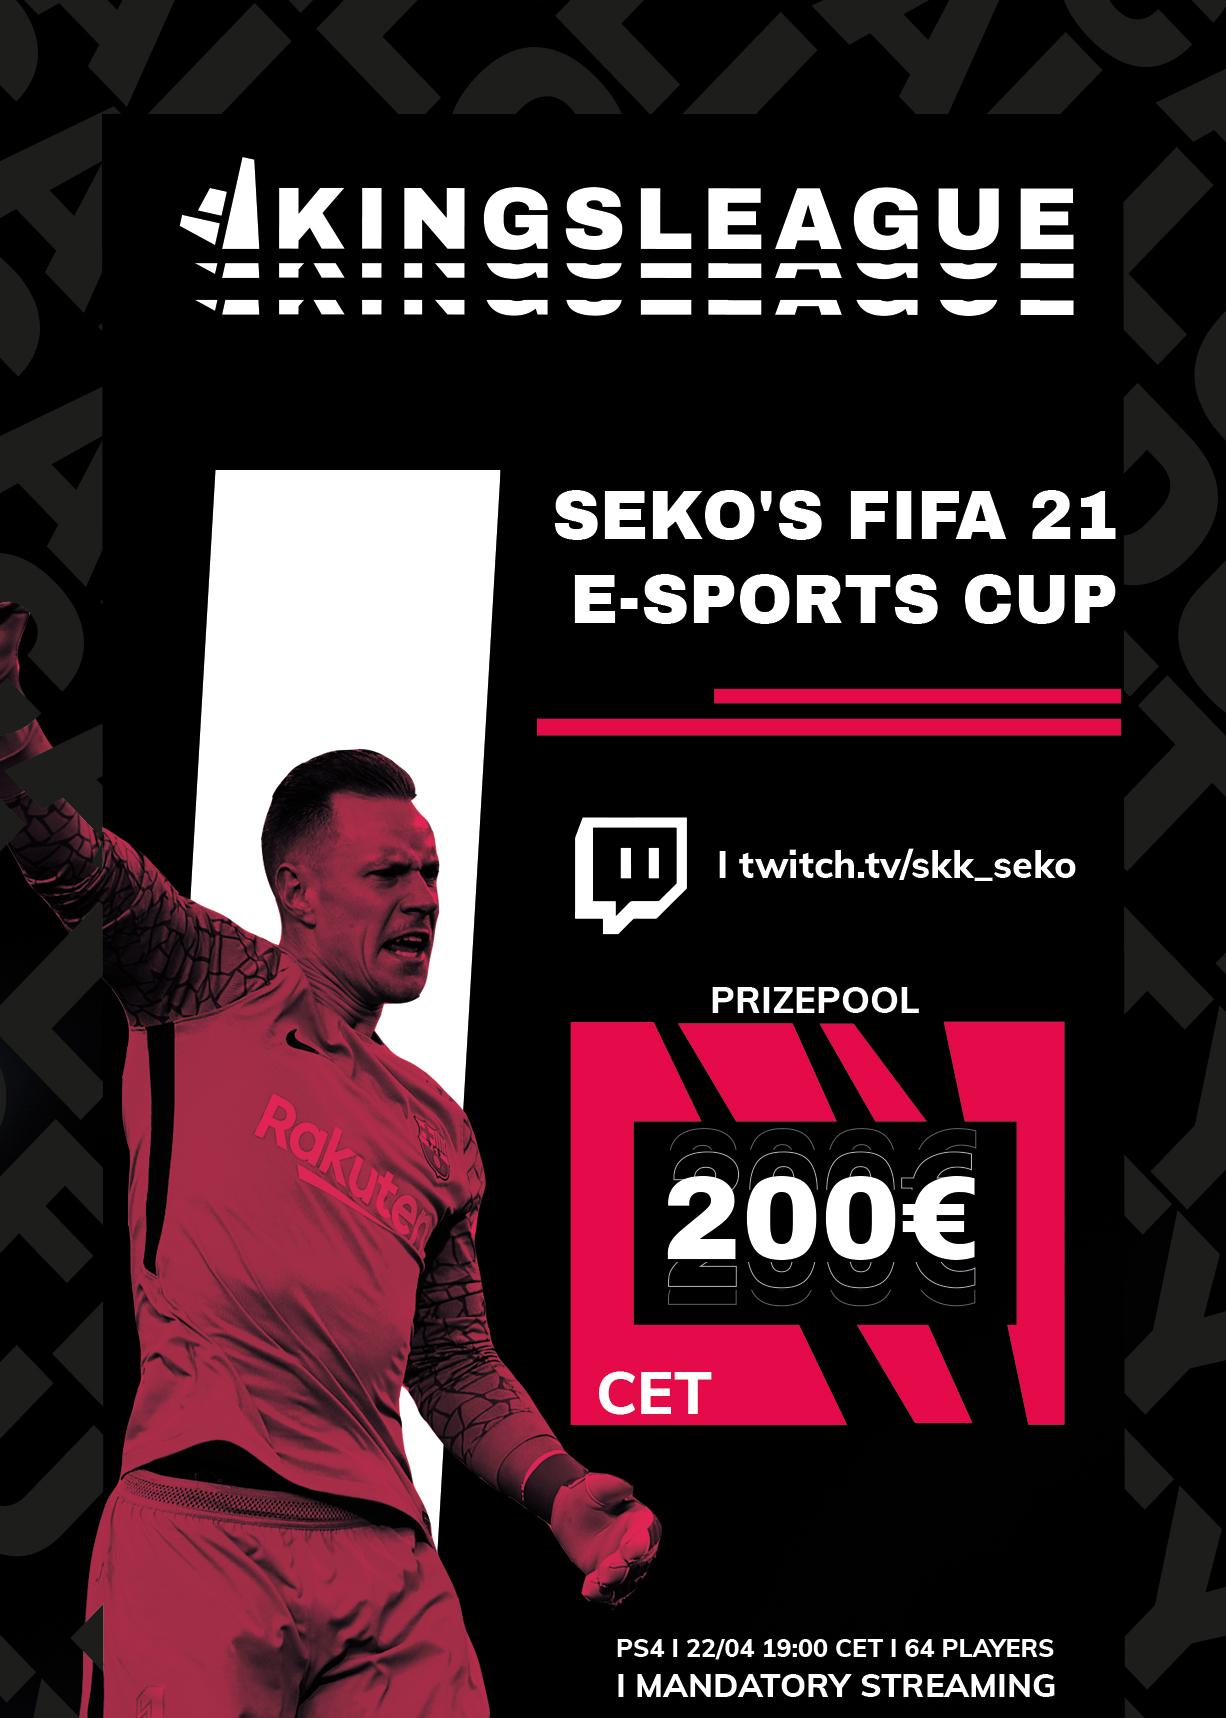 Kingsleague FIFA21 Cup by Seko